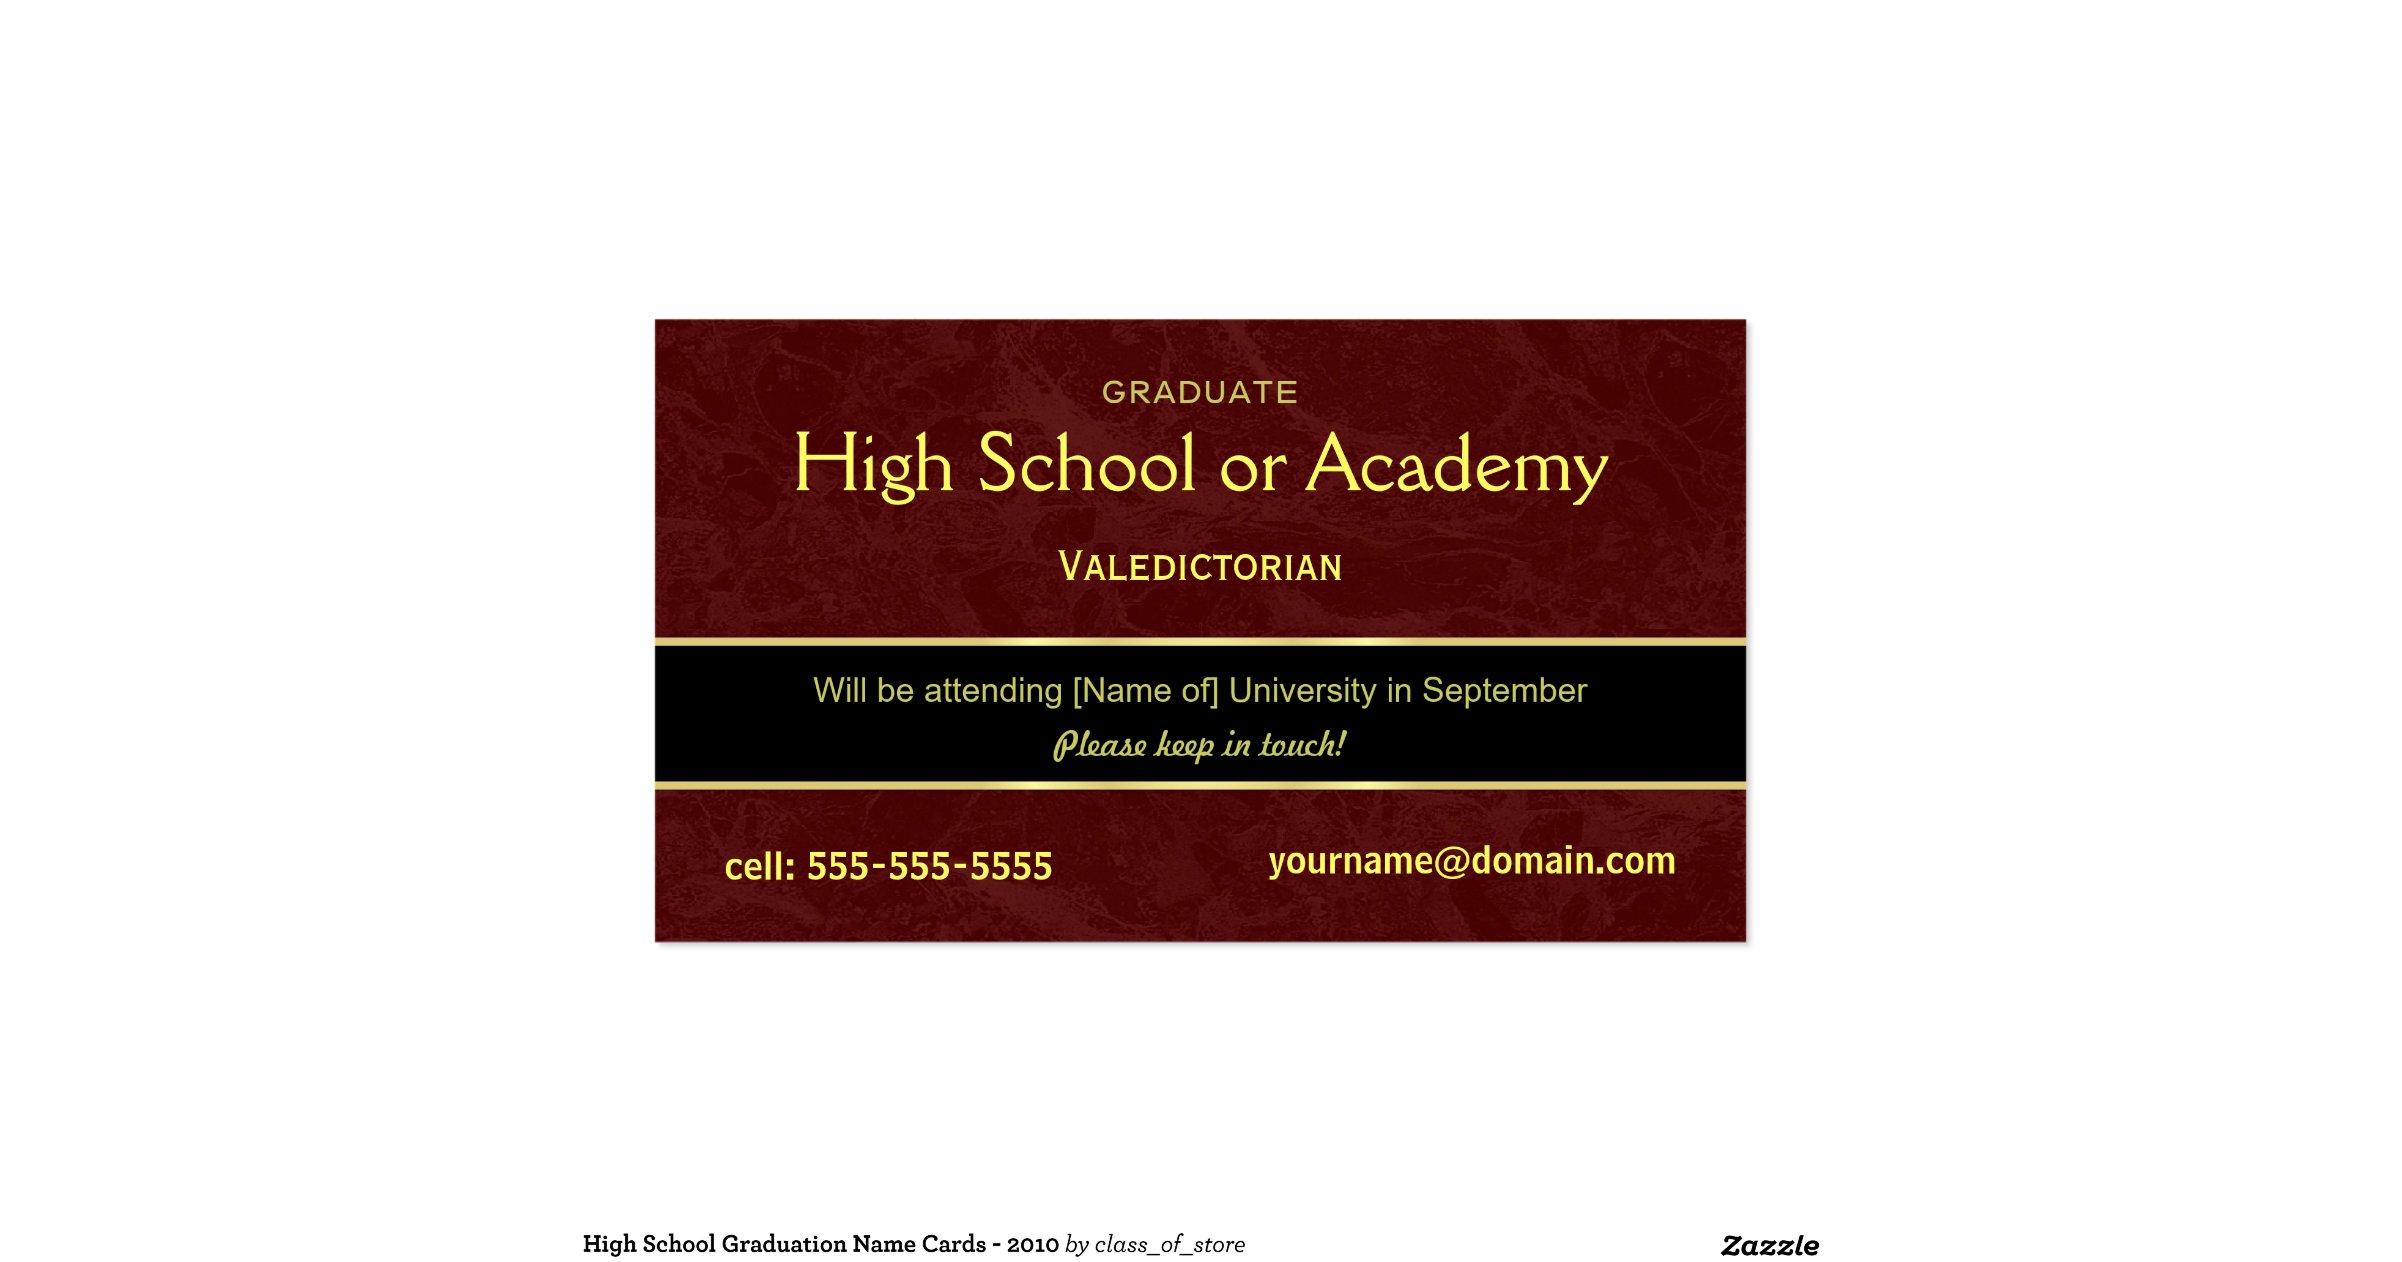 high school graduation name cards  2010 doublesided